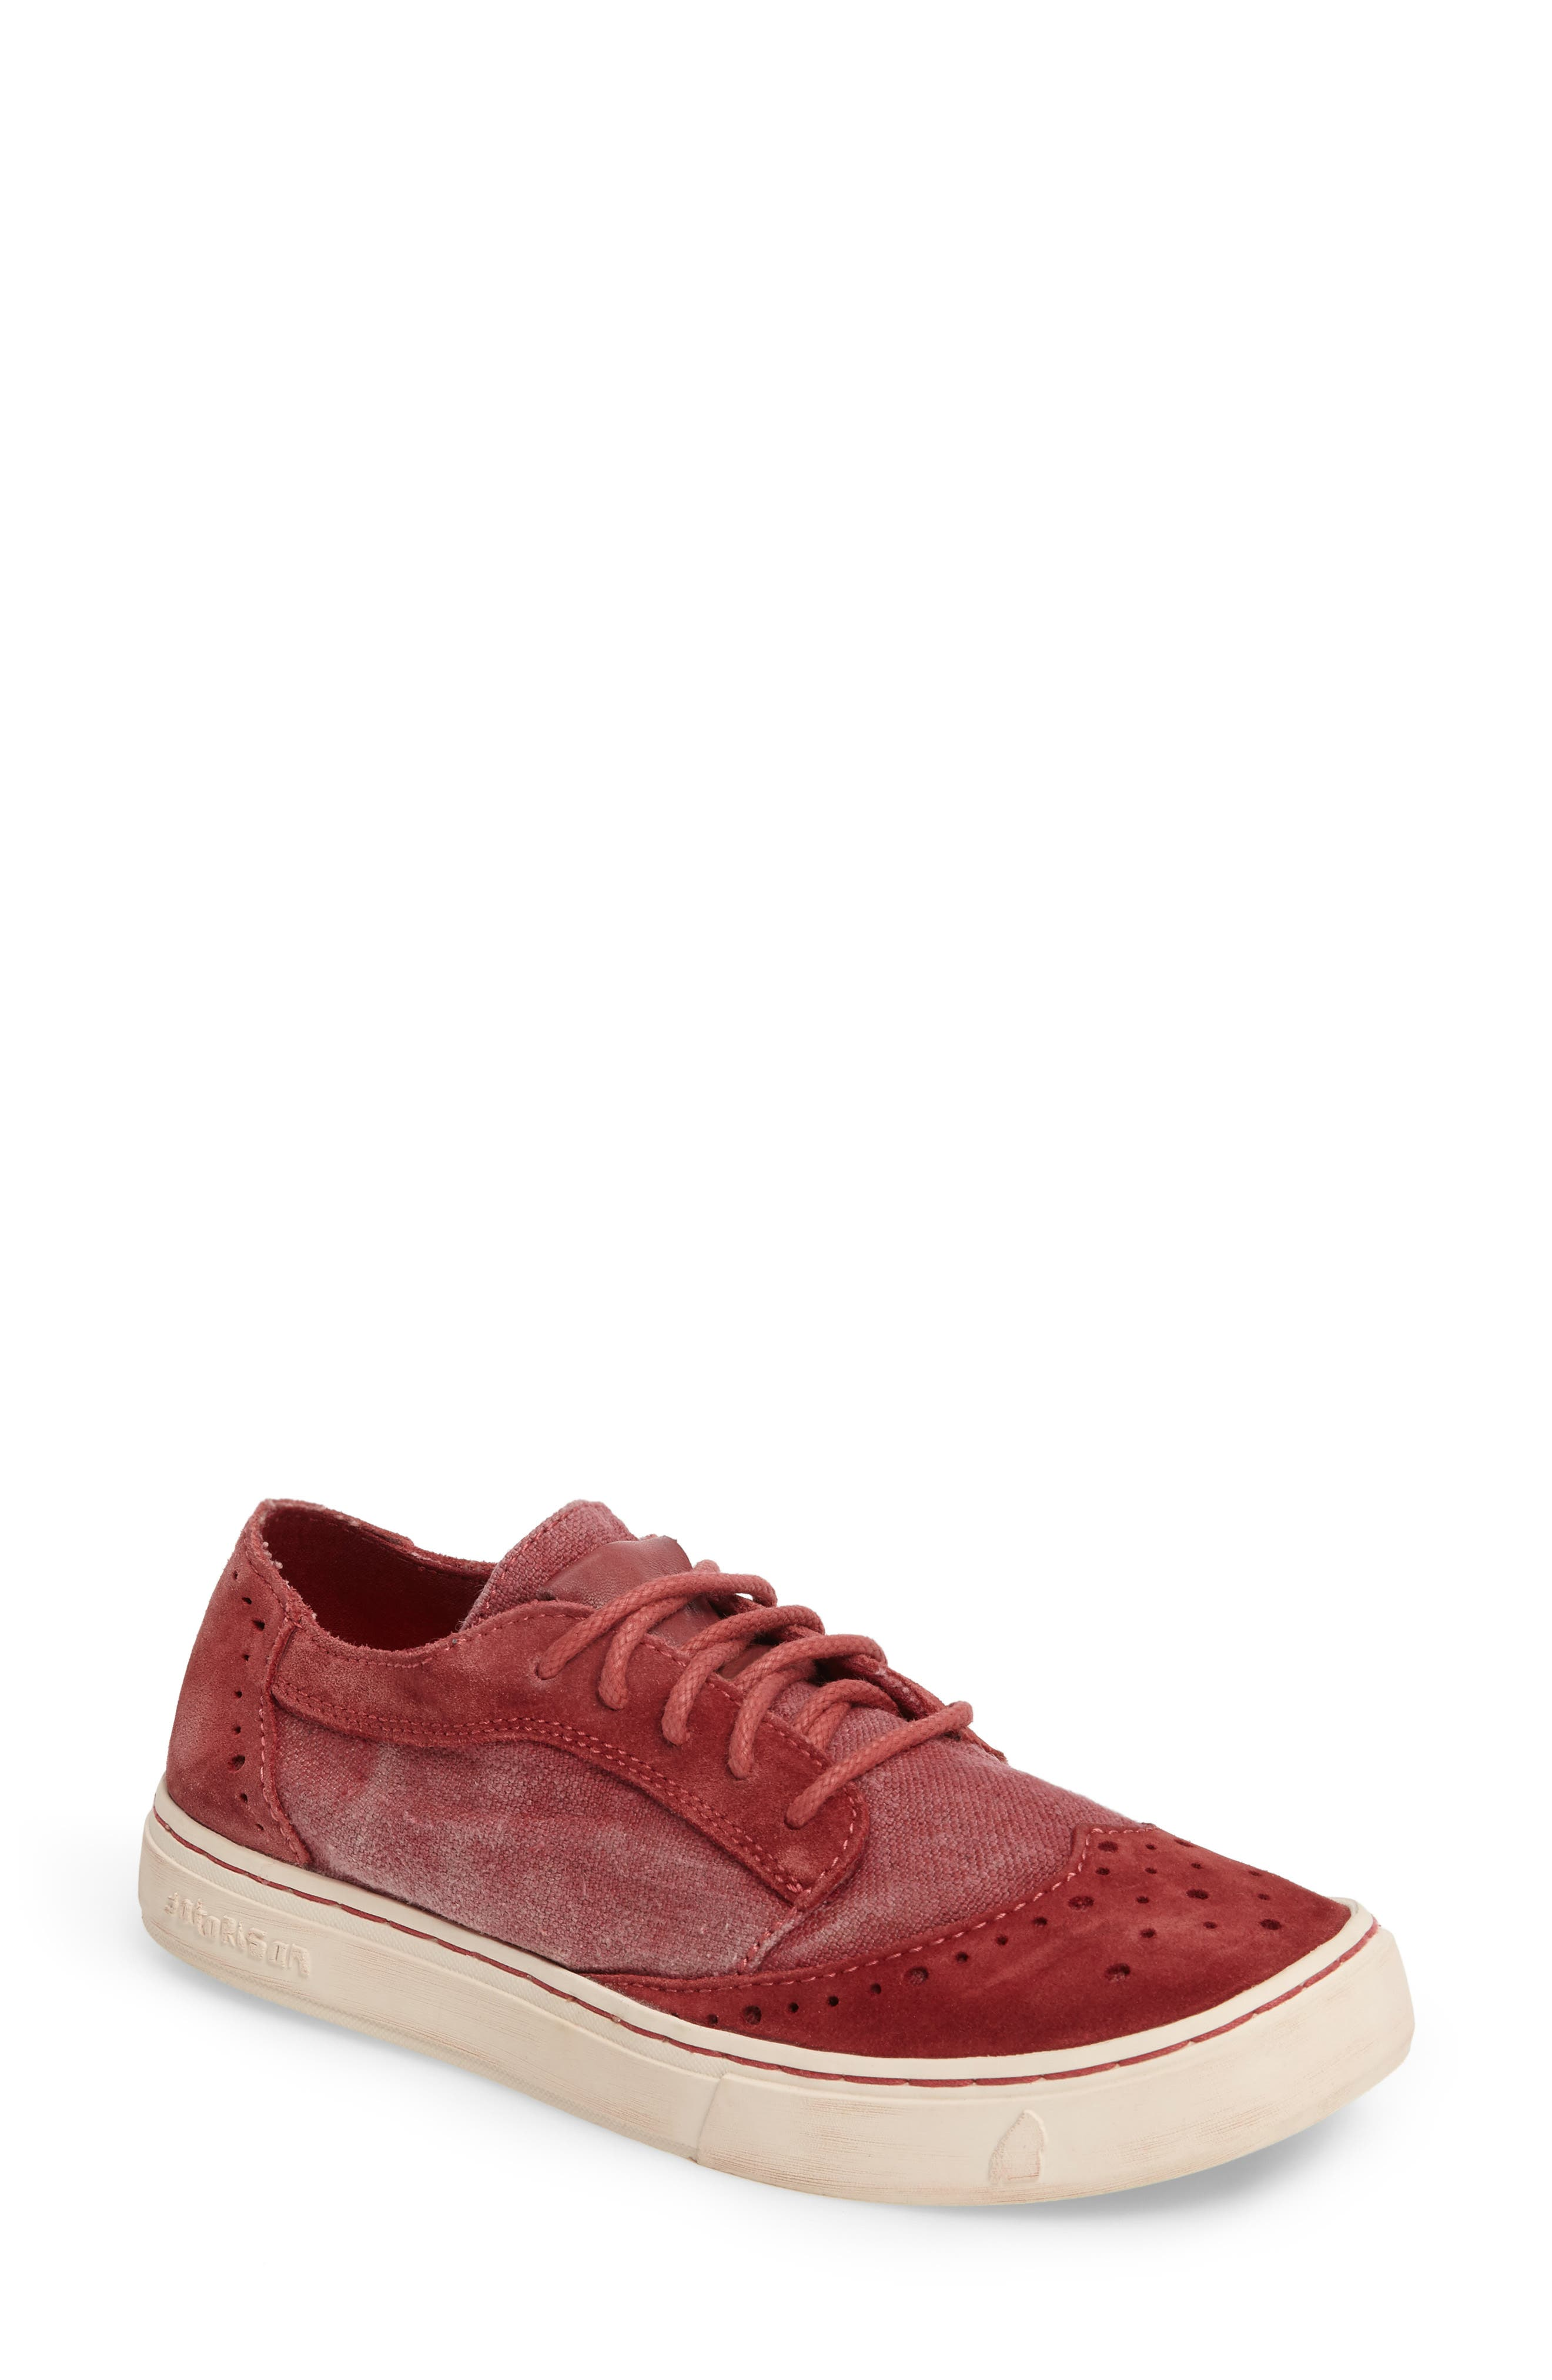 Yukai Sneaker,                         Main,                         color, Sandalwood